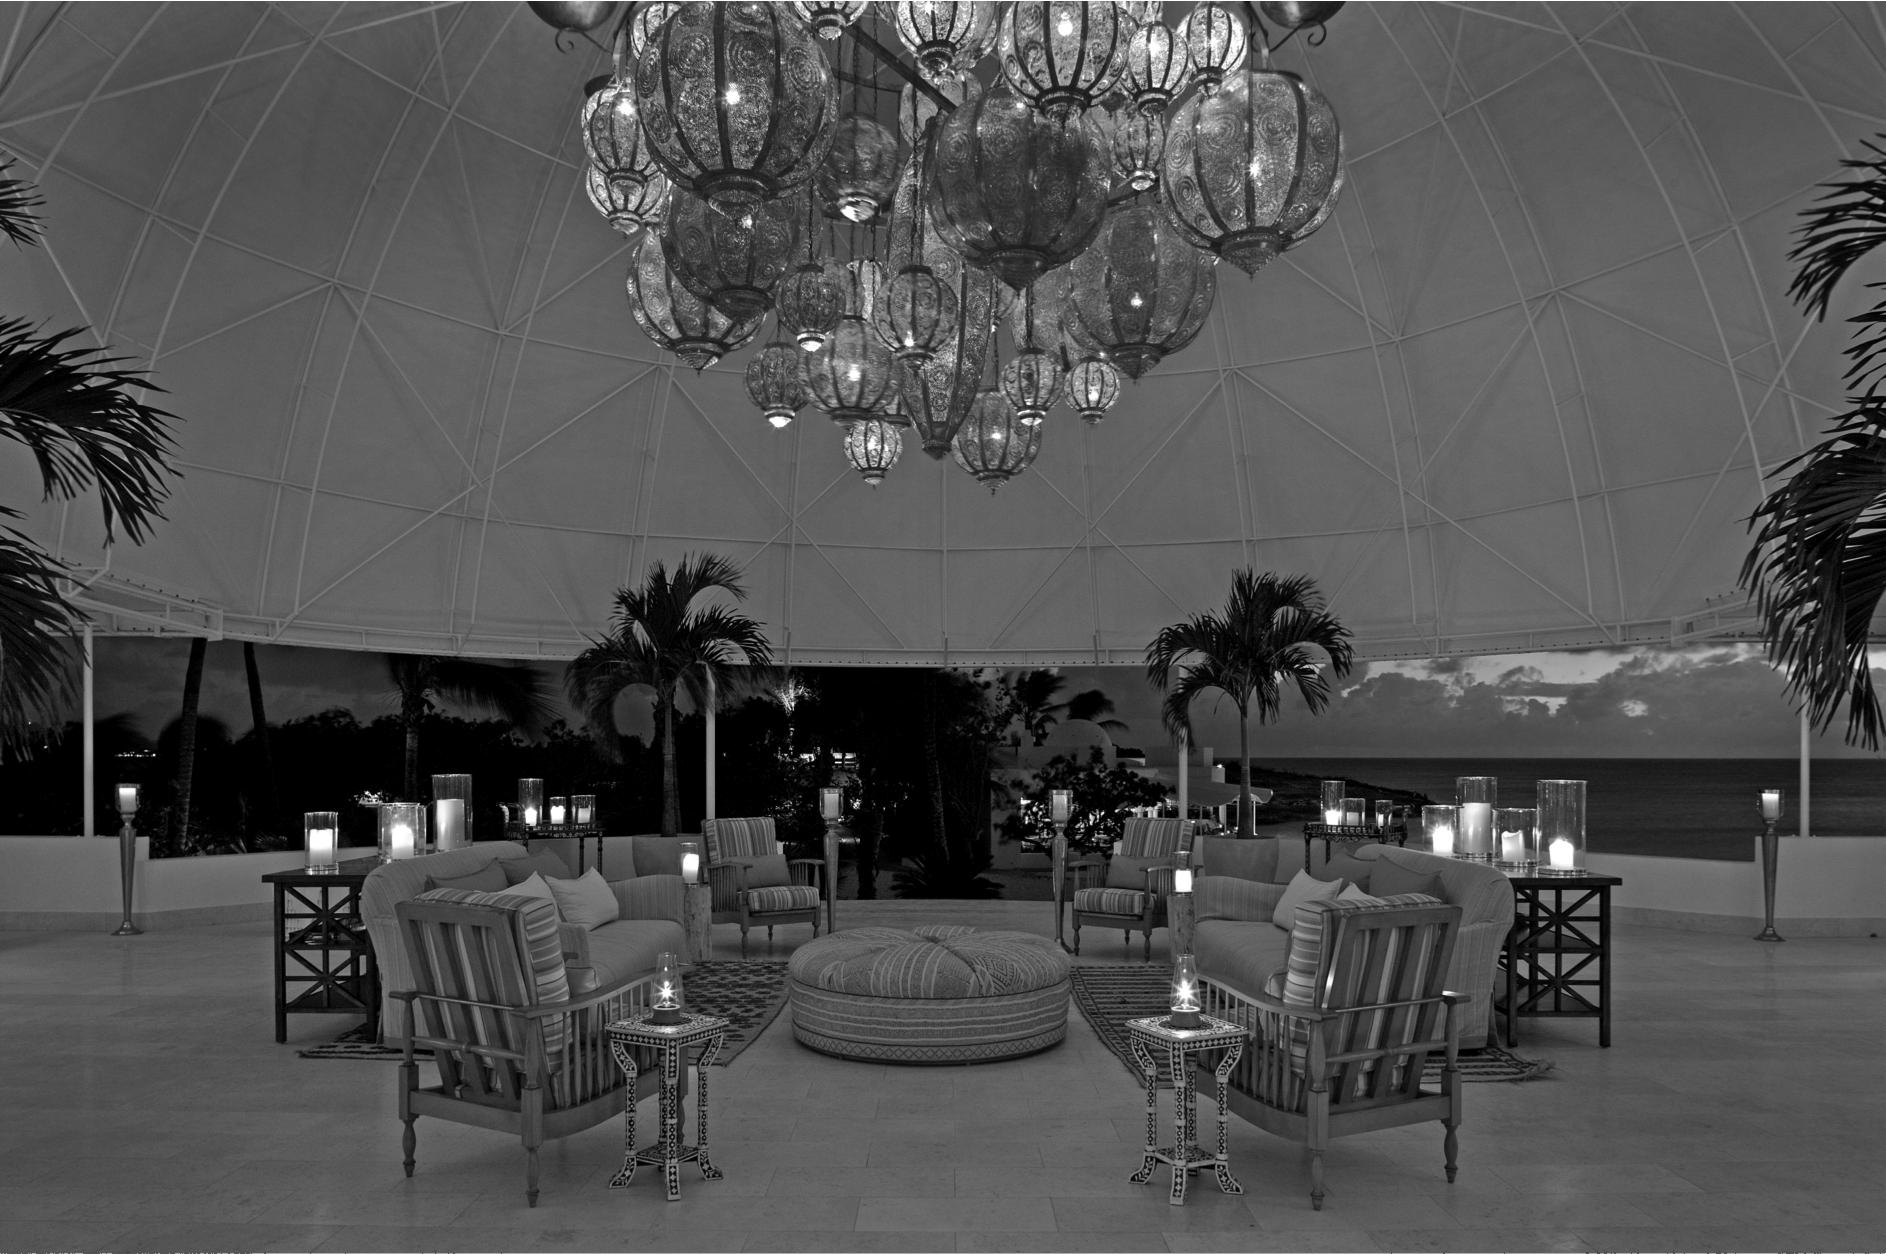 HMG Dome BW